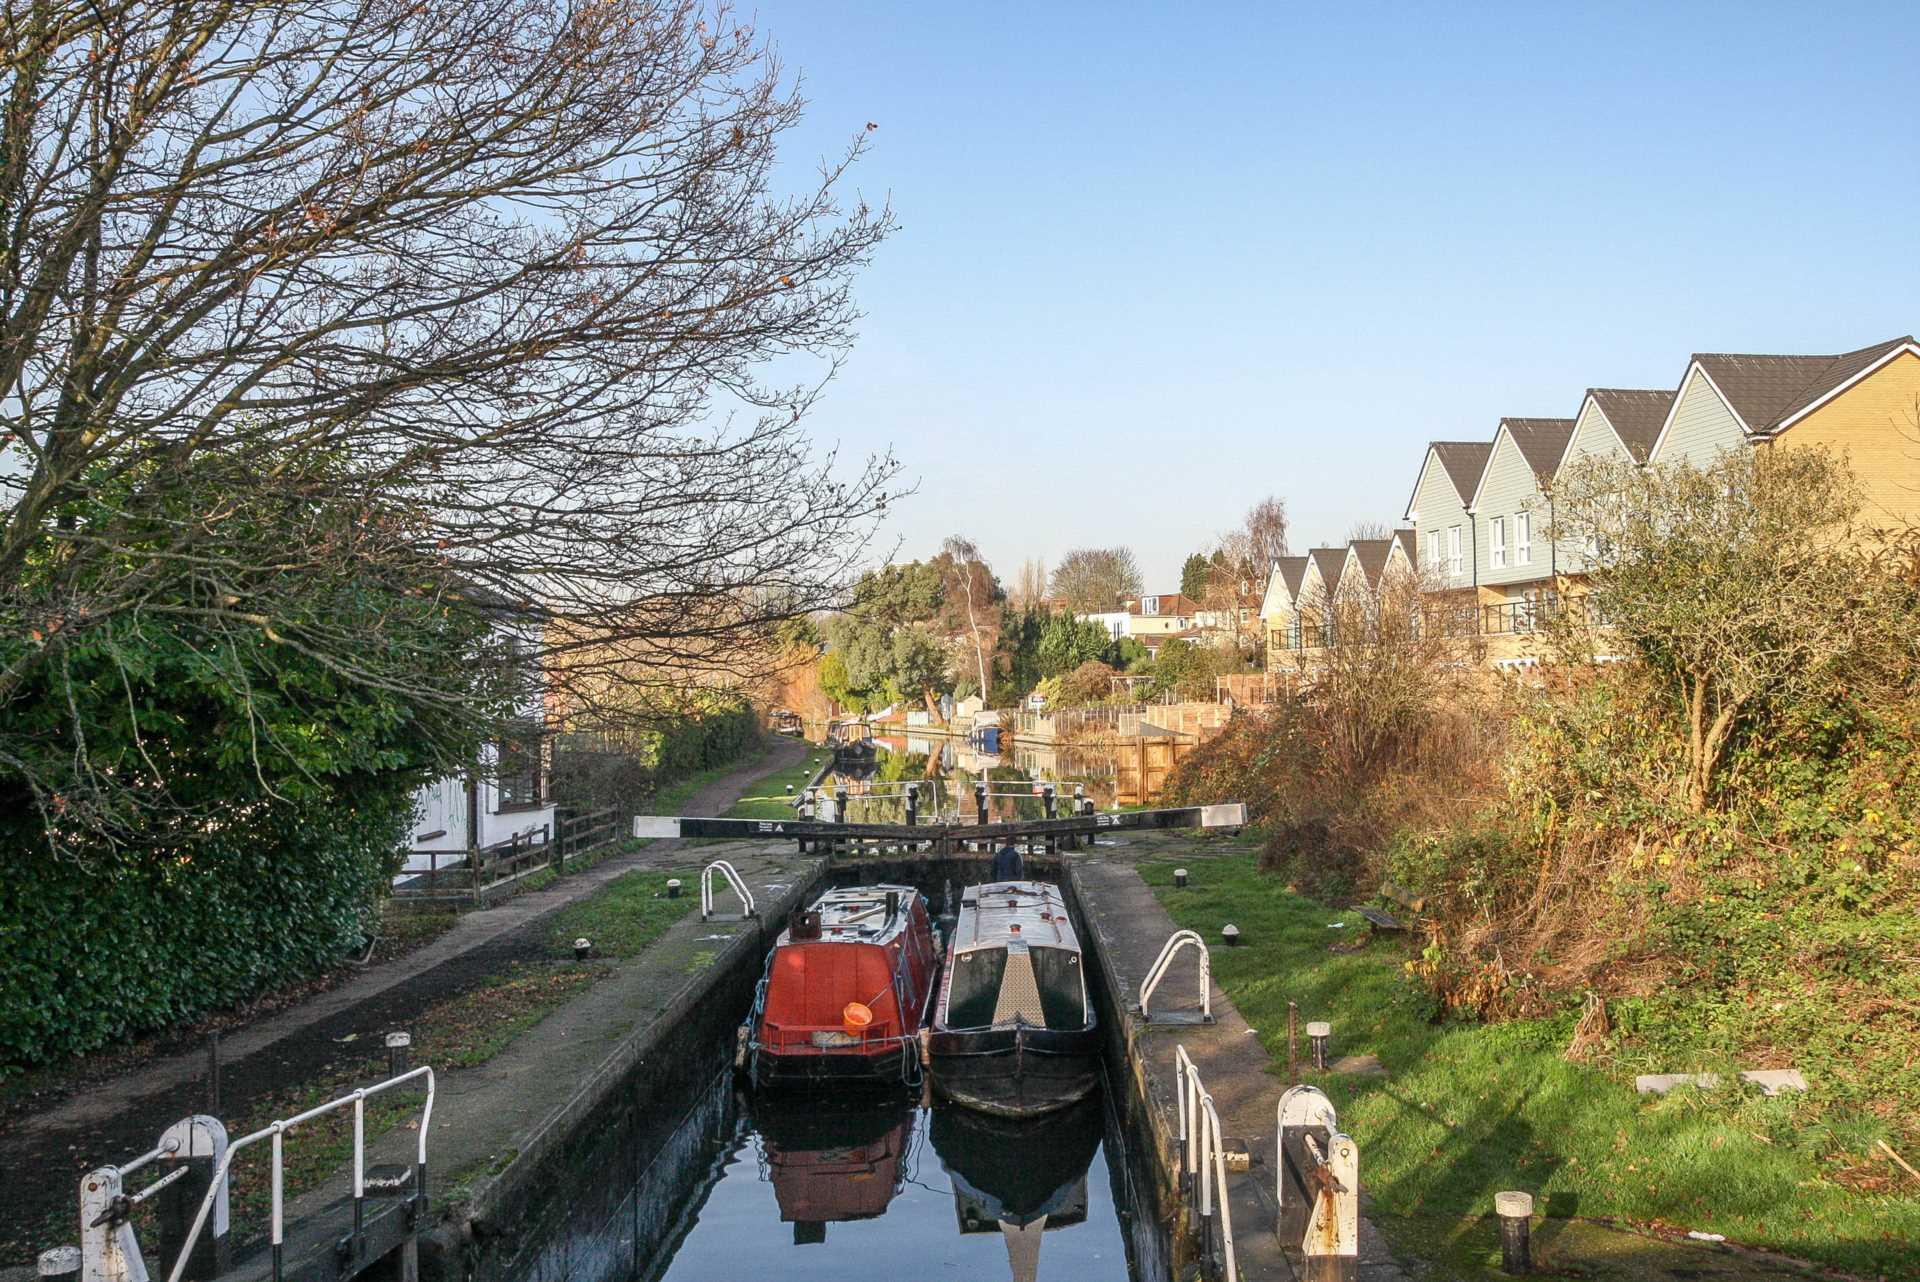 Ebberns Road, Apsley, Image 15